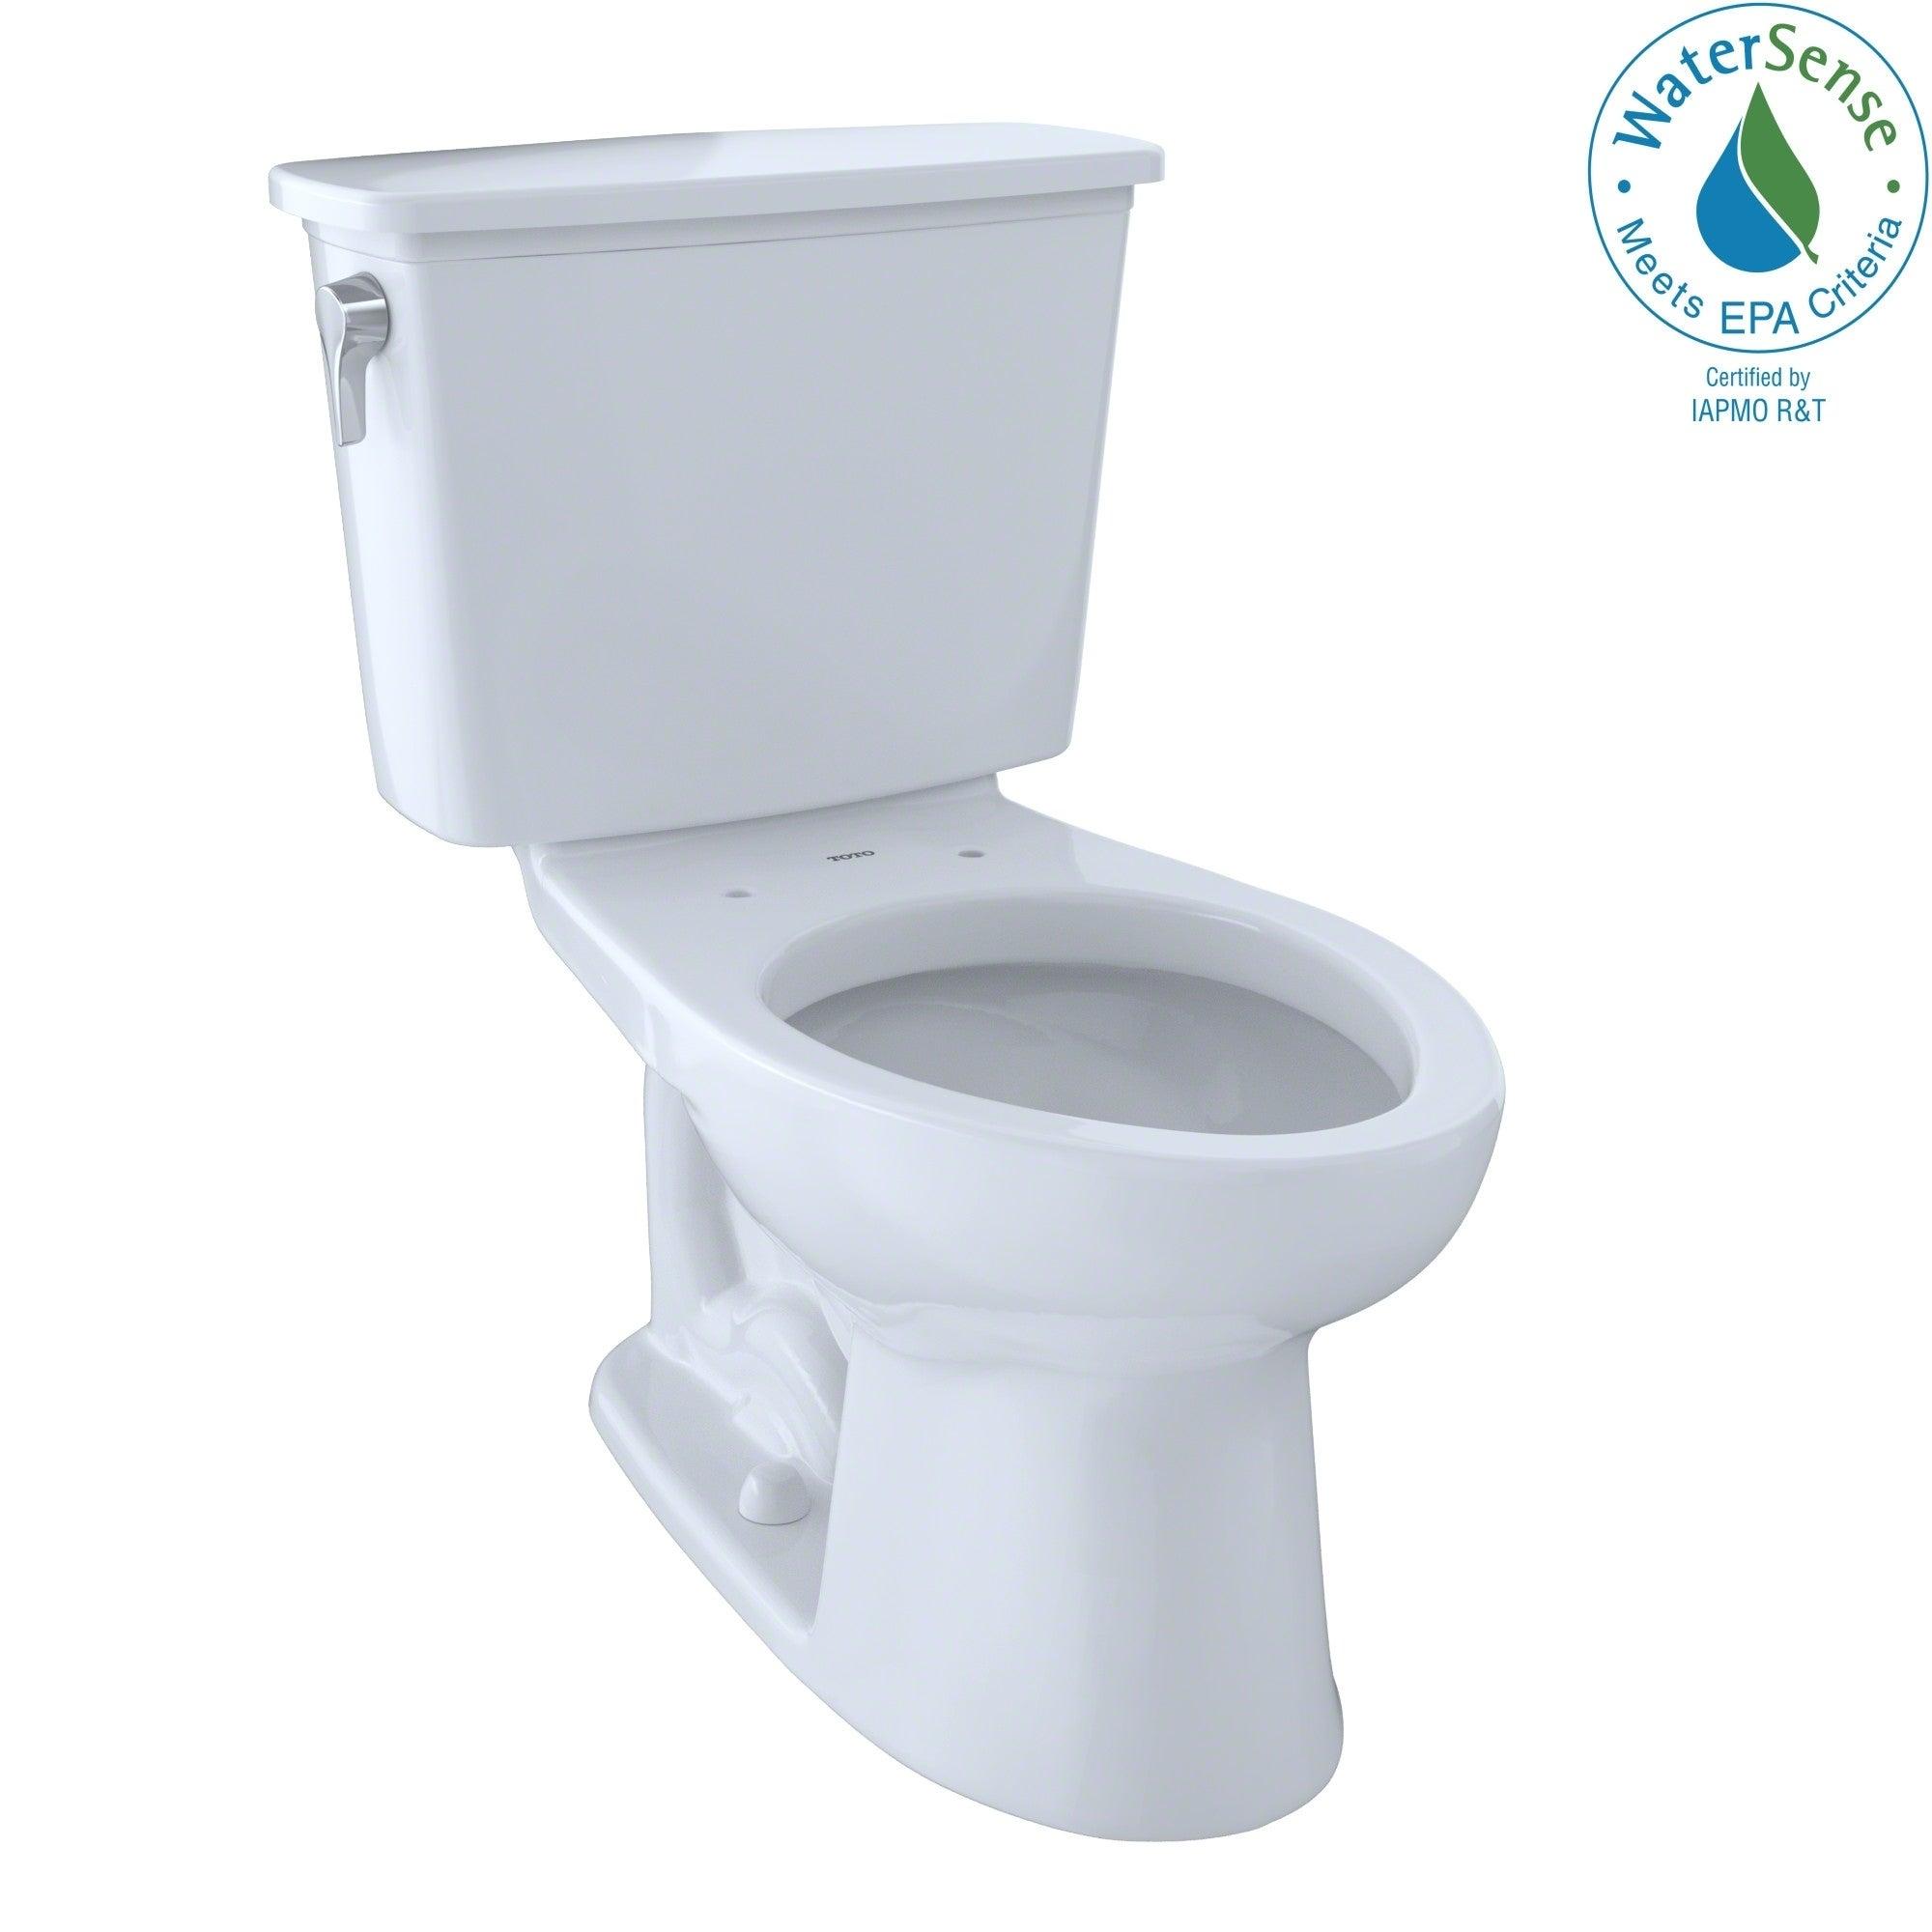 Toto CST744ELN-01 Eco-drake Ada Elongated Bowl Toilet (Co...